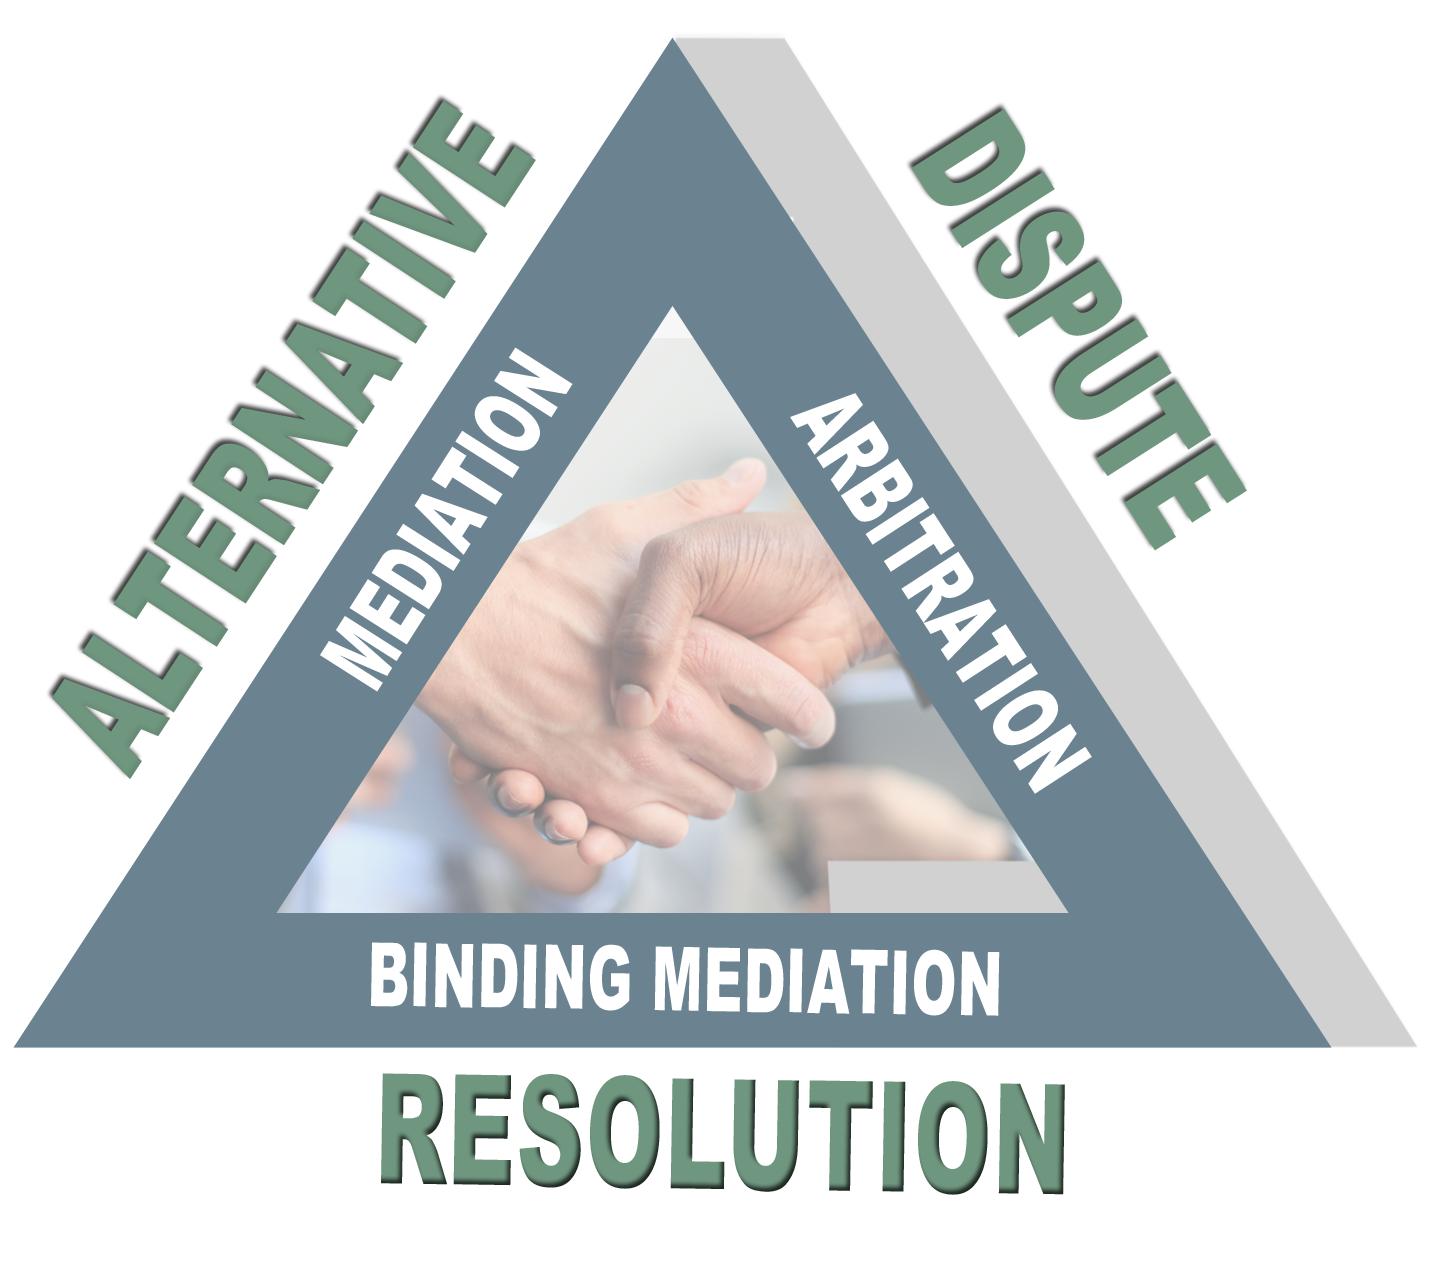 Benefits Of Binding Mediation As An Alternative Dispute